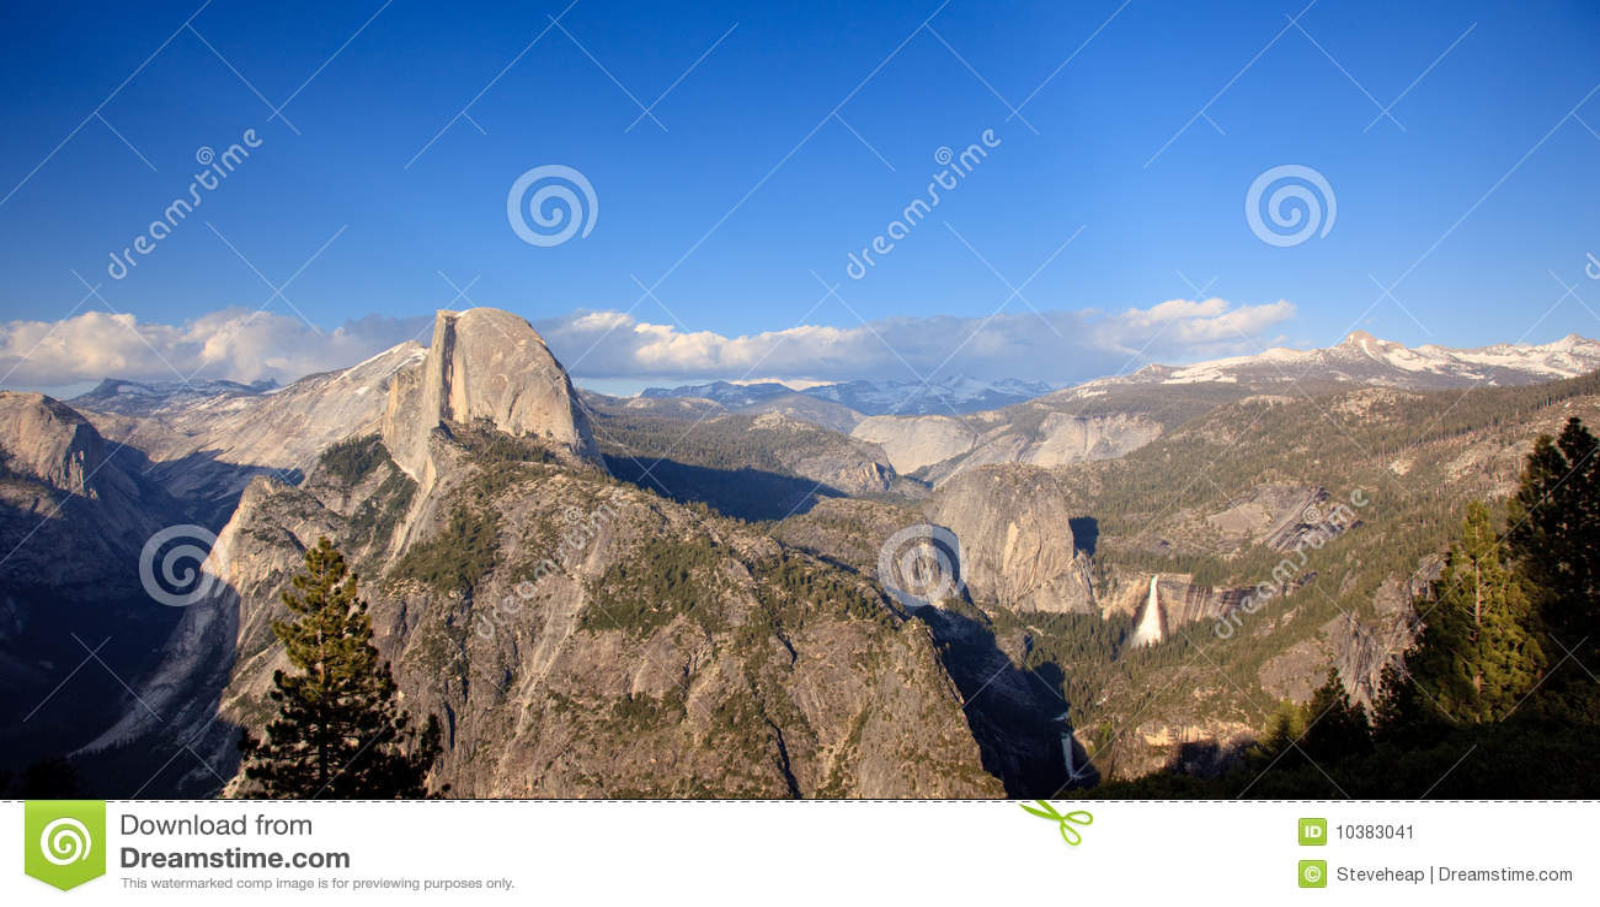 Panorama of Yosemite with Half Dome